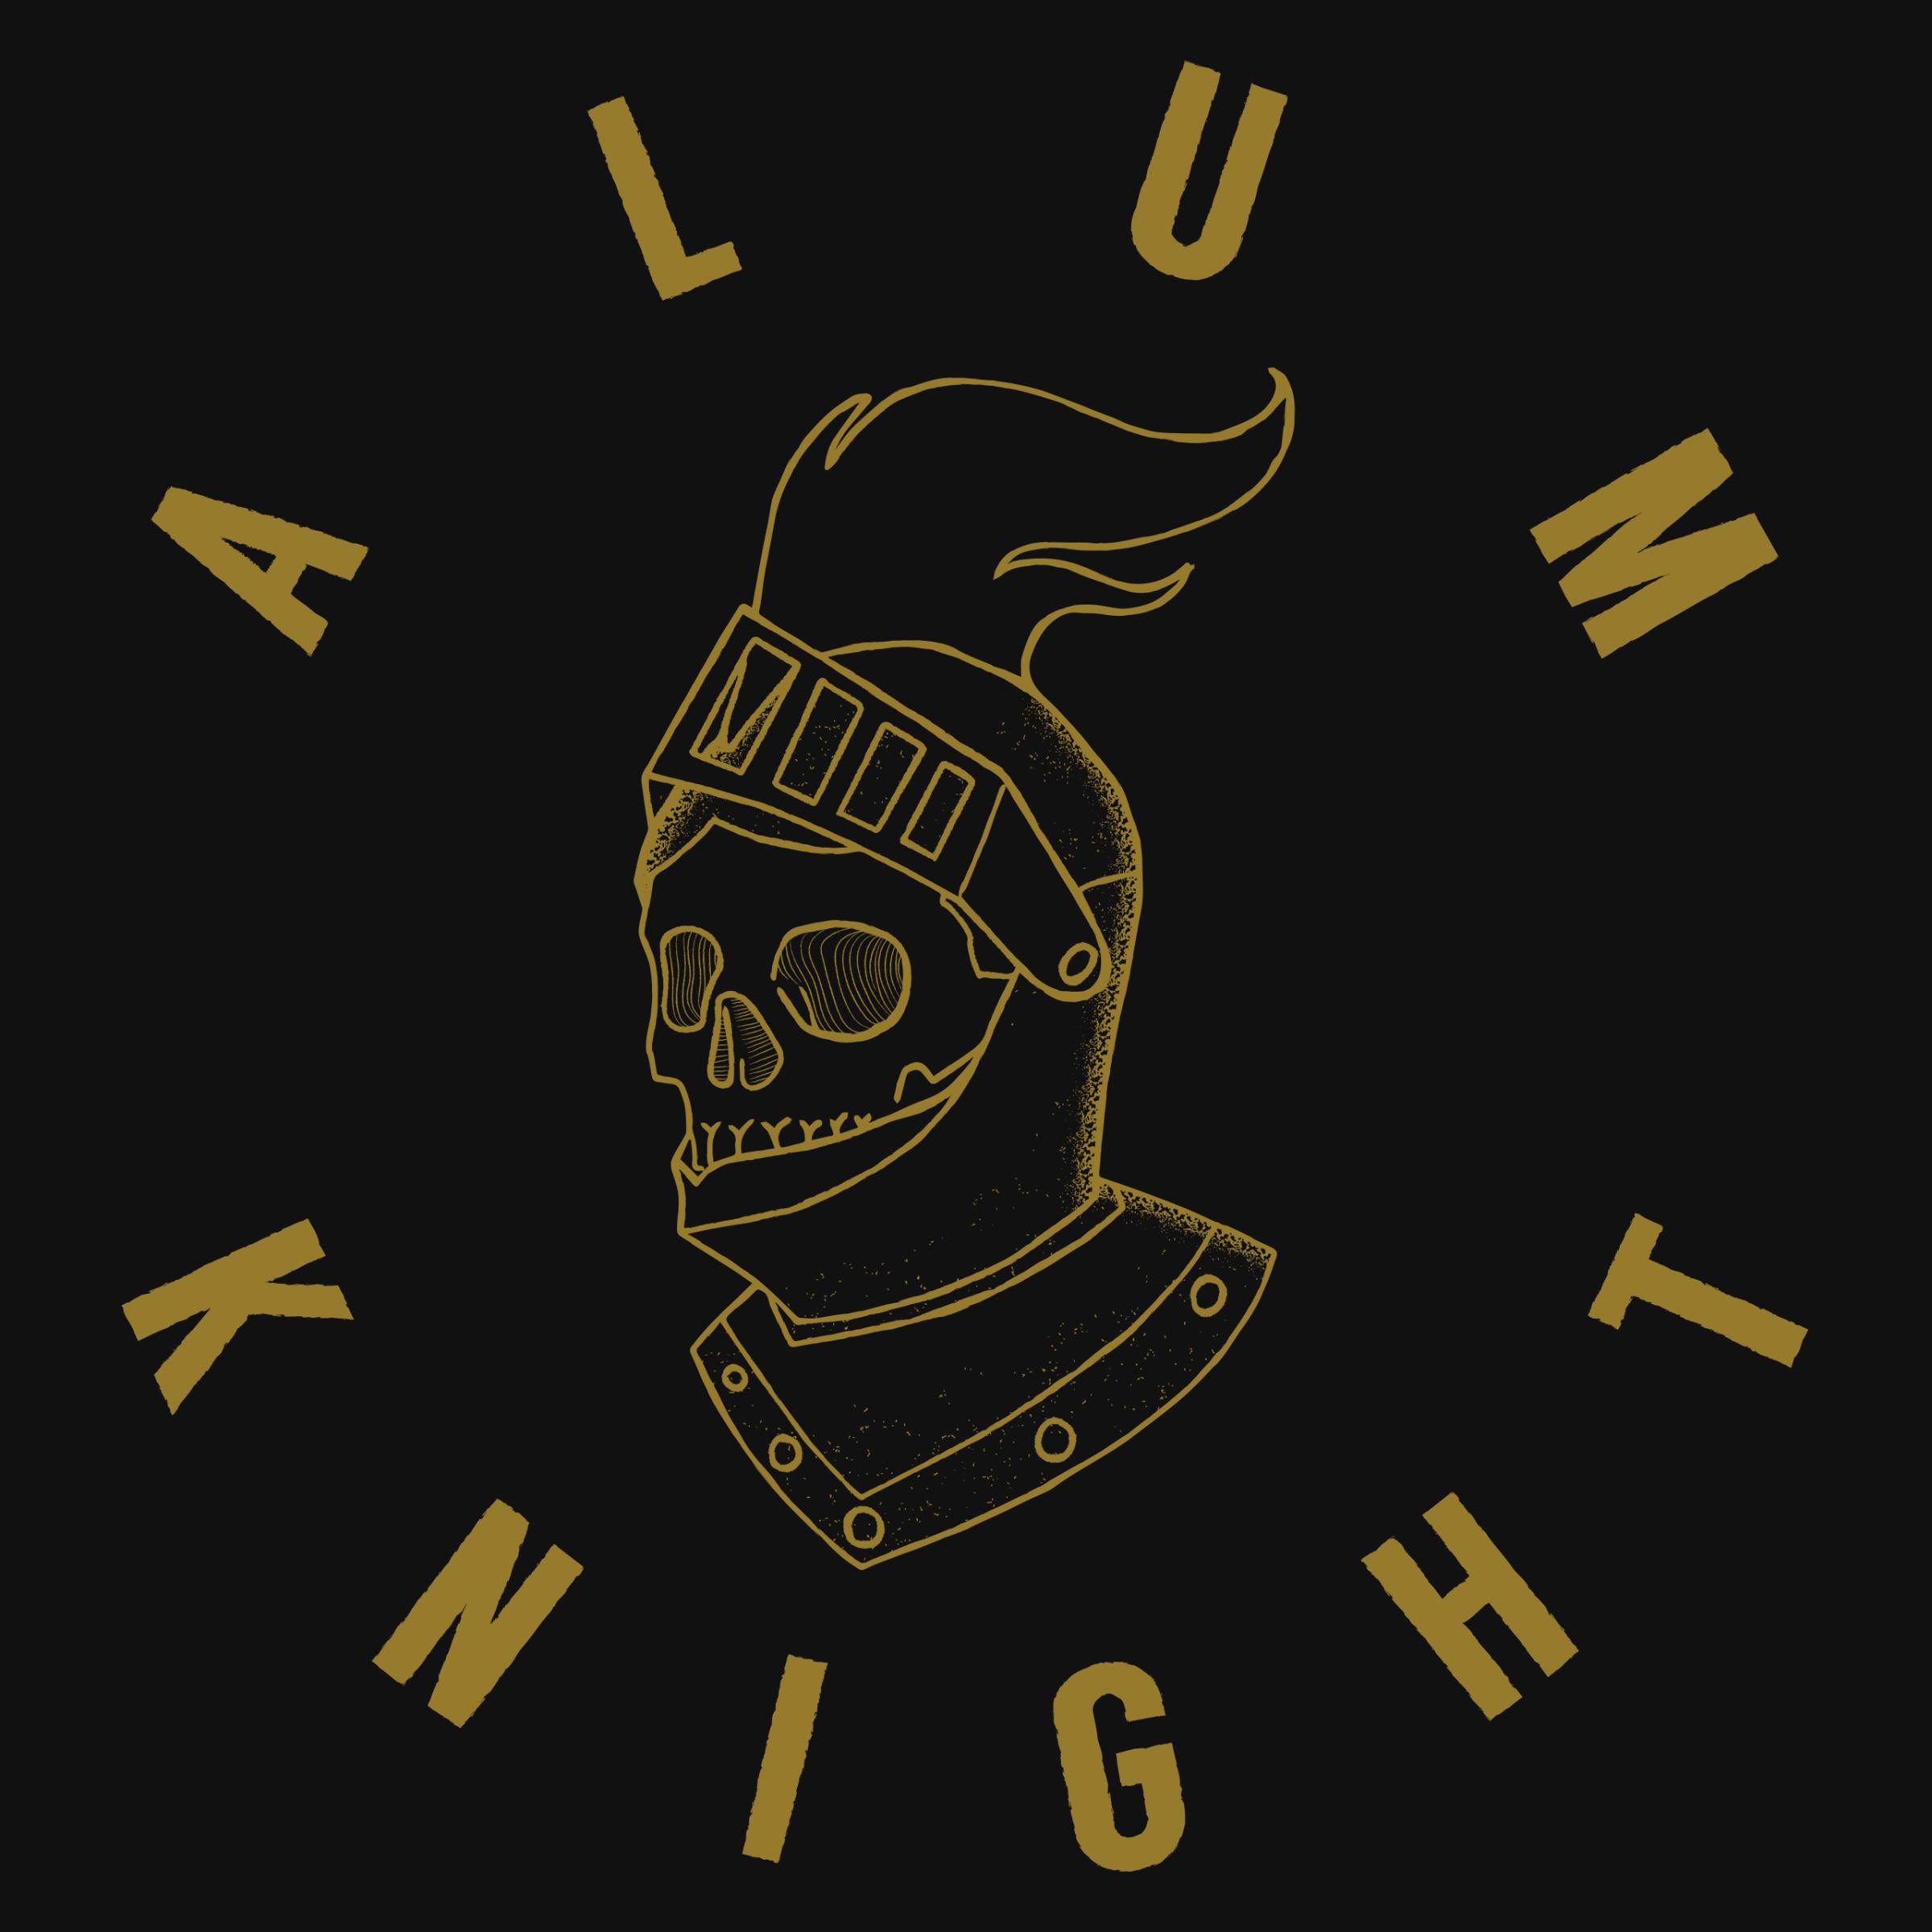 The Alum Knights